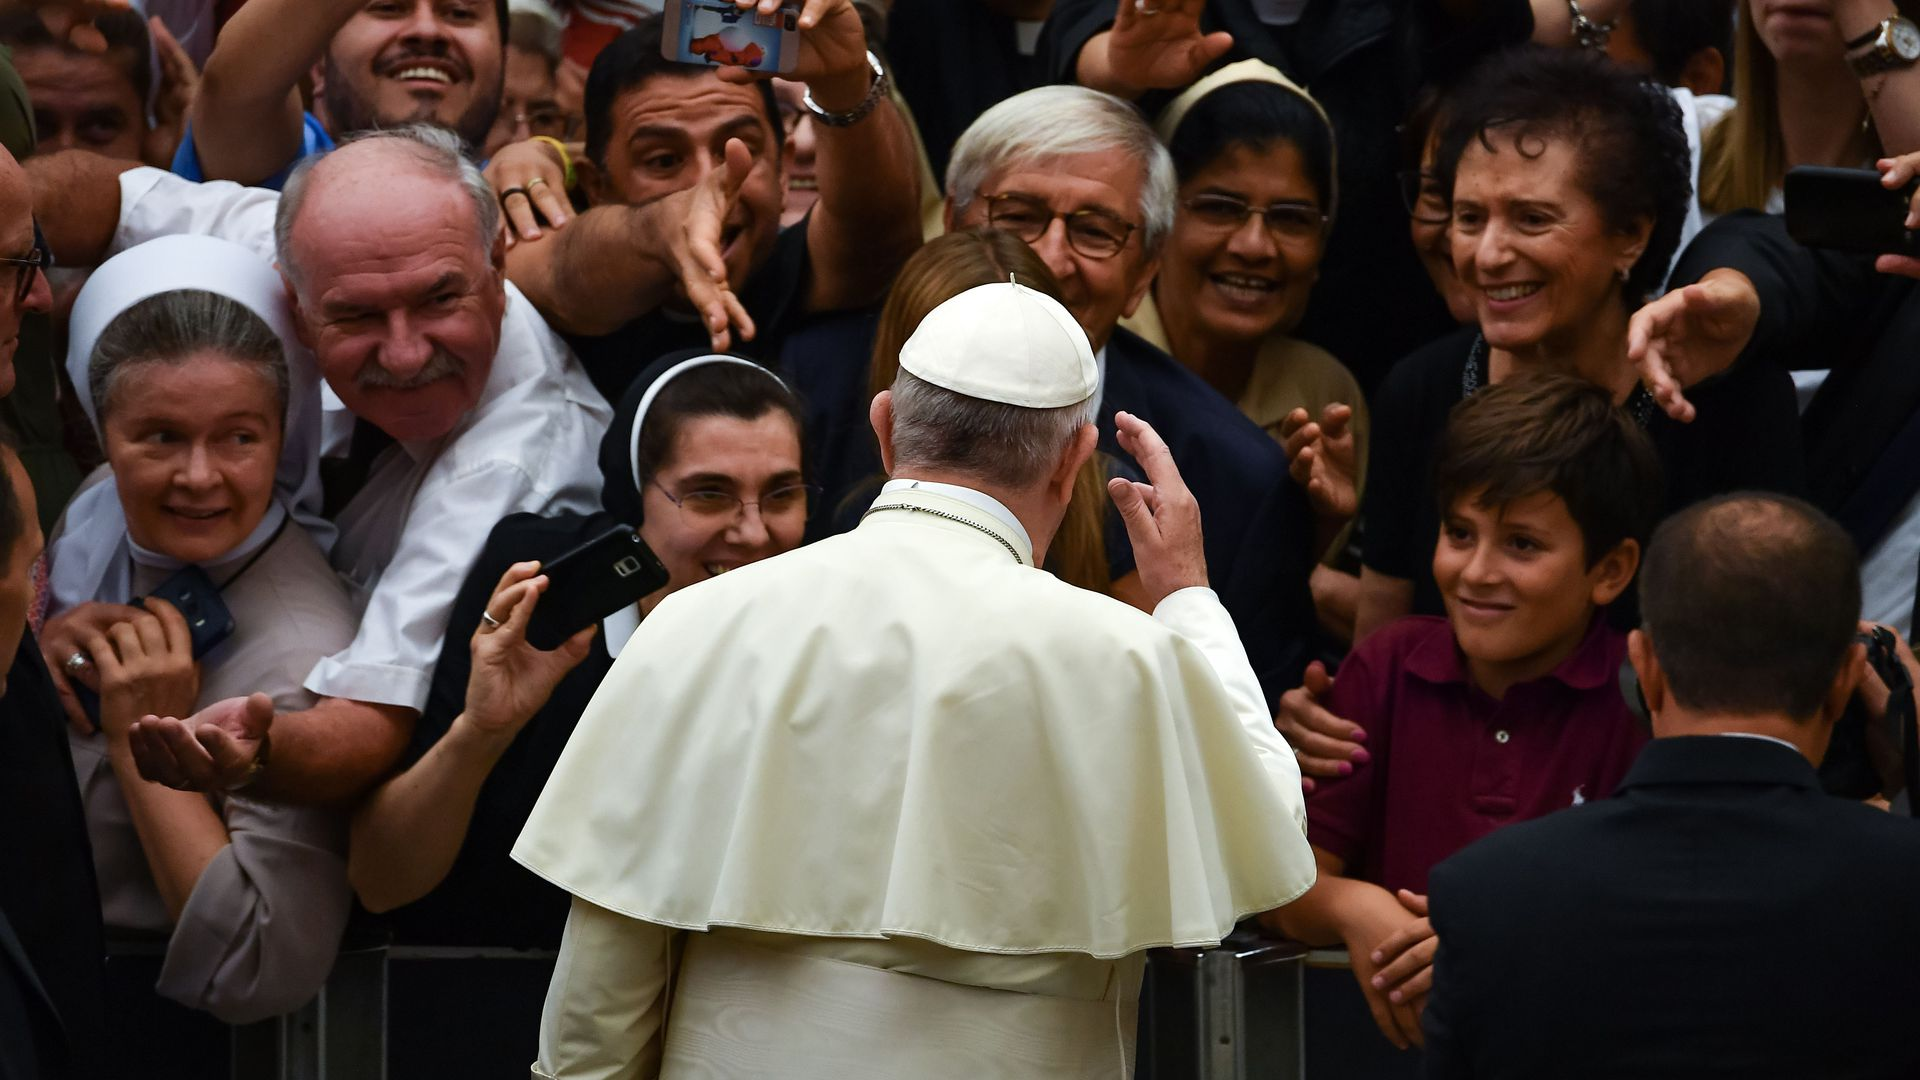 The Catholic church faces an ominous decline - Axios